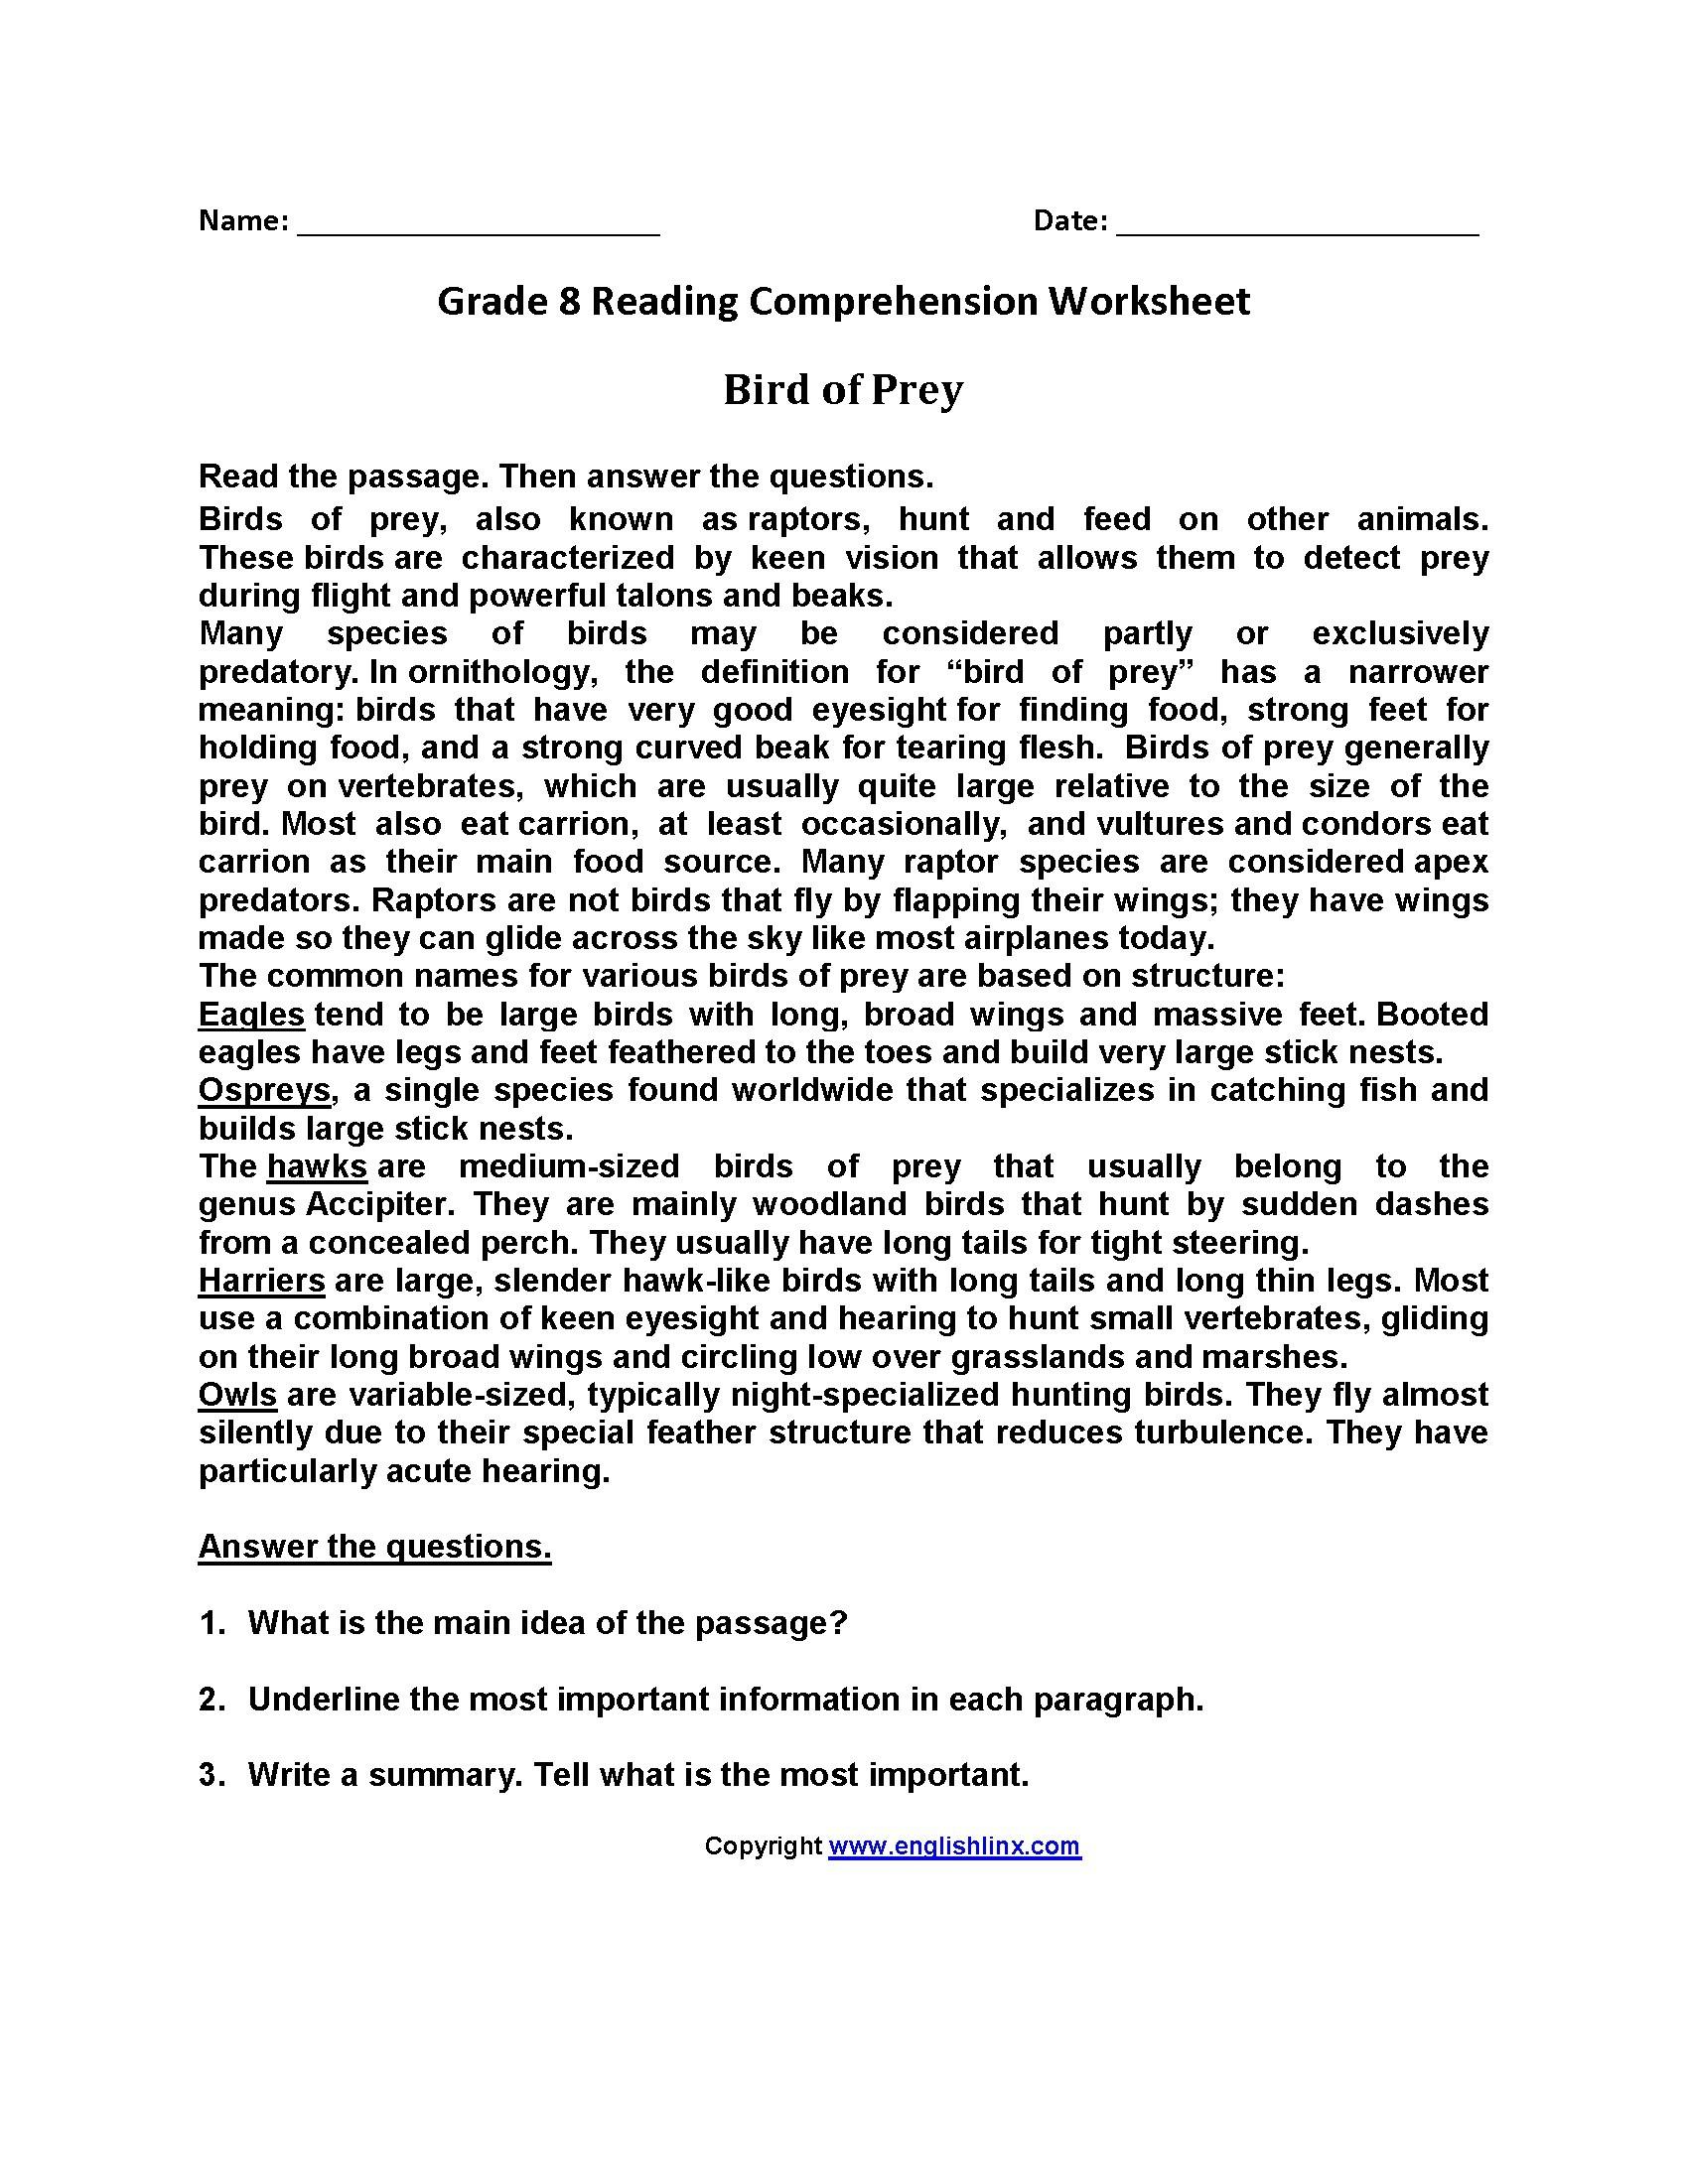 Free Printable Reading Comprehension Worksheets 3Rd Grade For - Free Printable Reading Comprehension Worksheets For 3Rd Grade